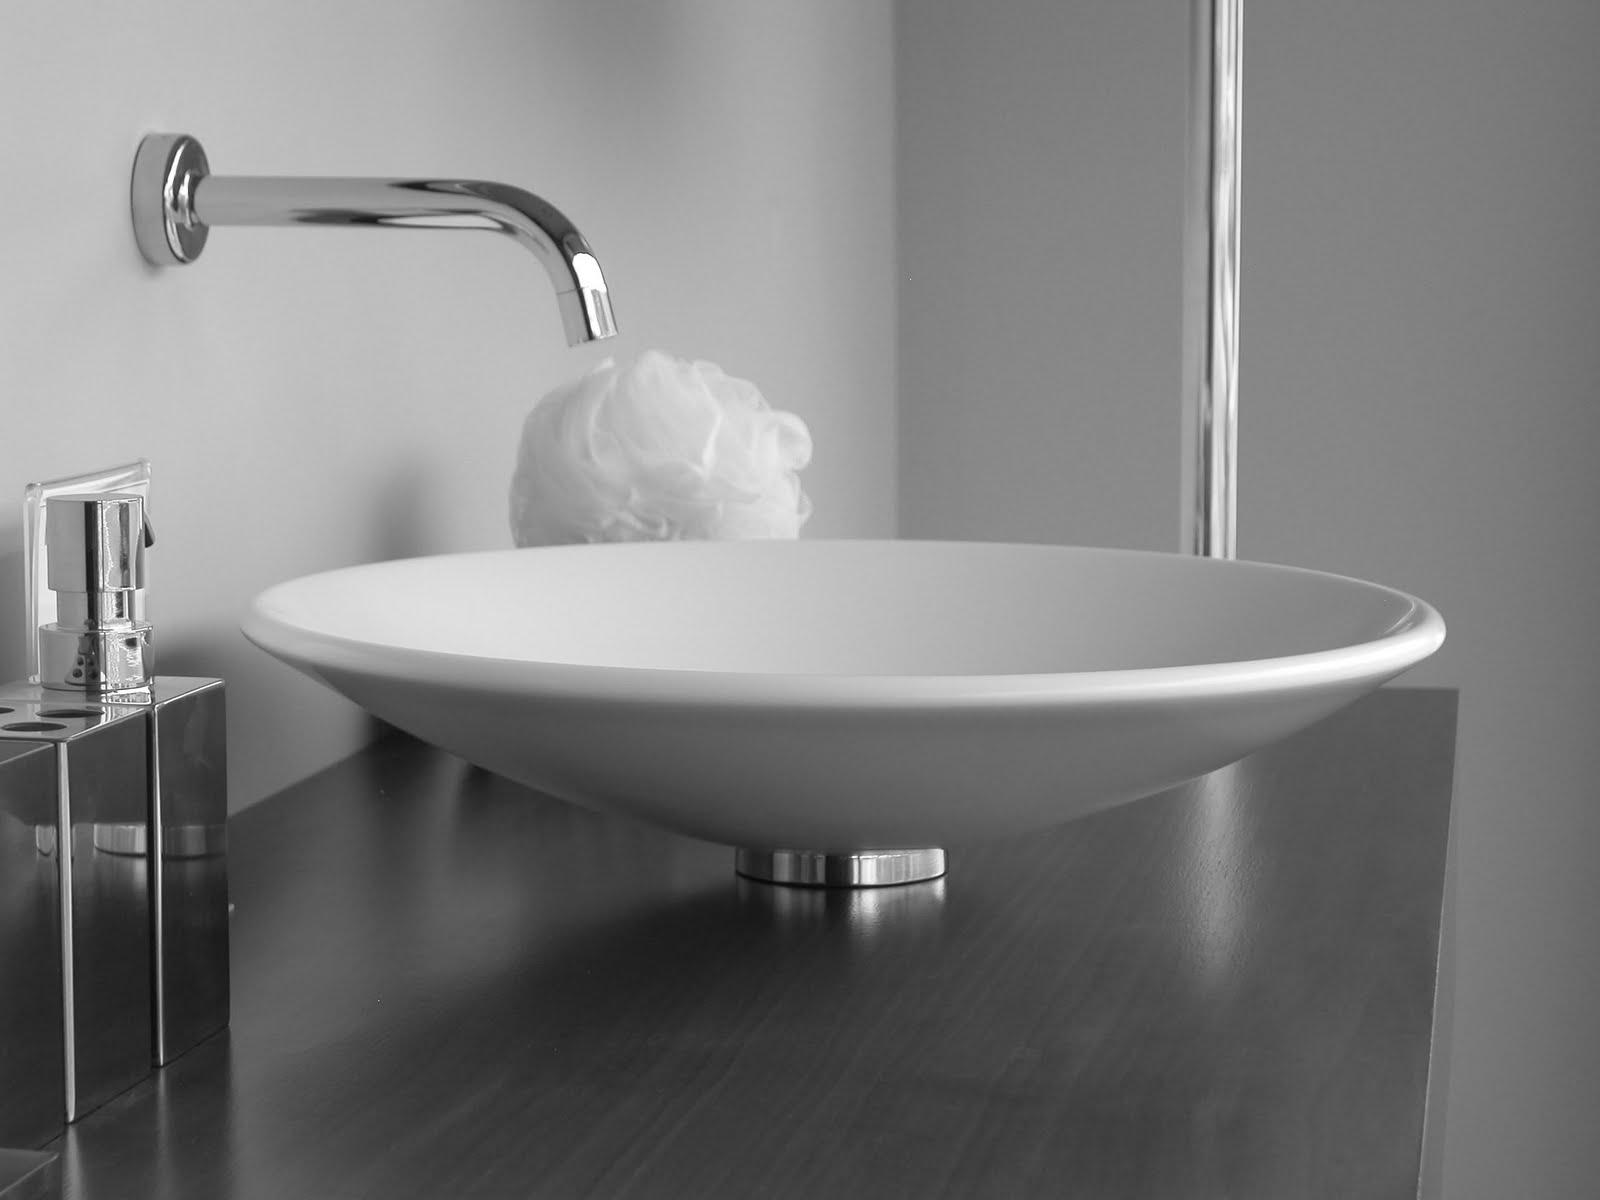 Inset wash basin vanity basin washbasins - Kava Wash Basin